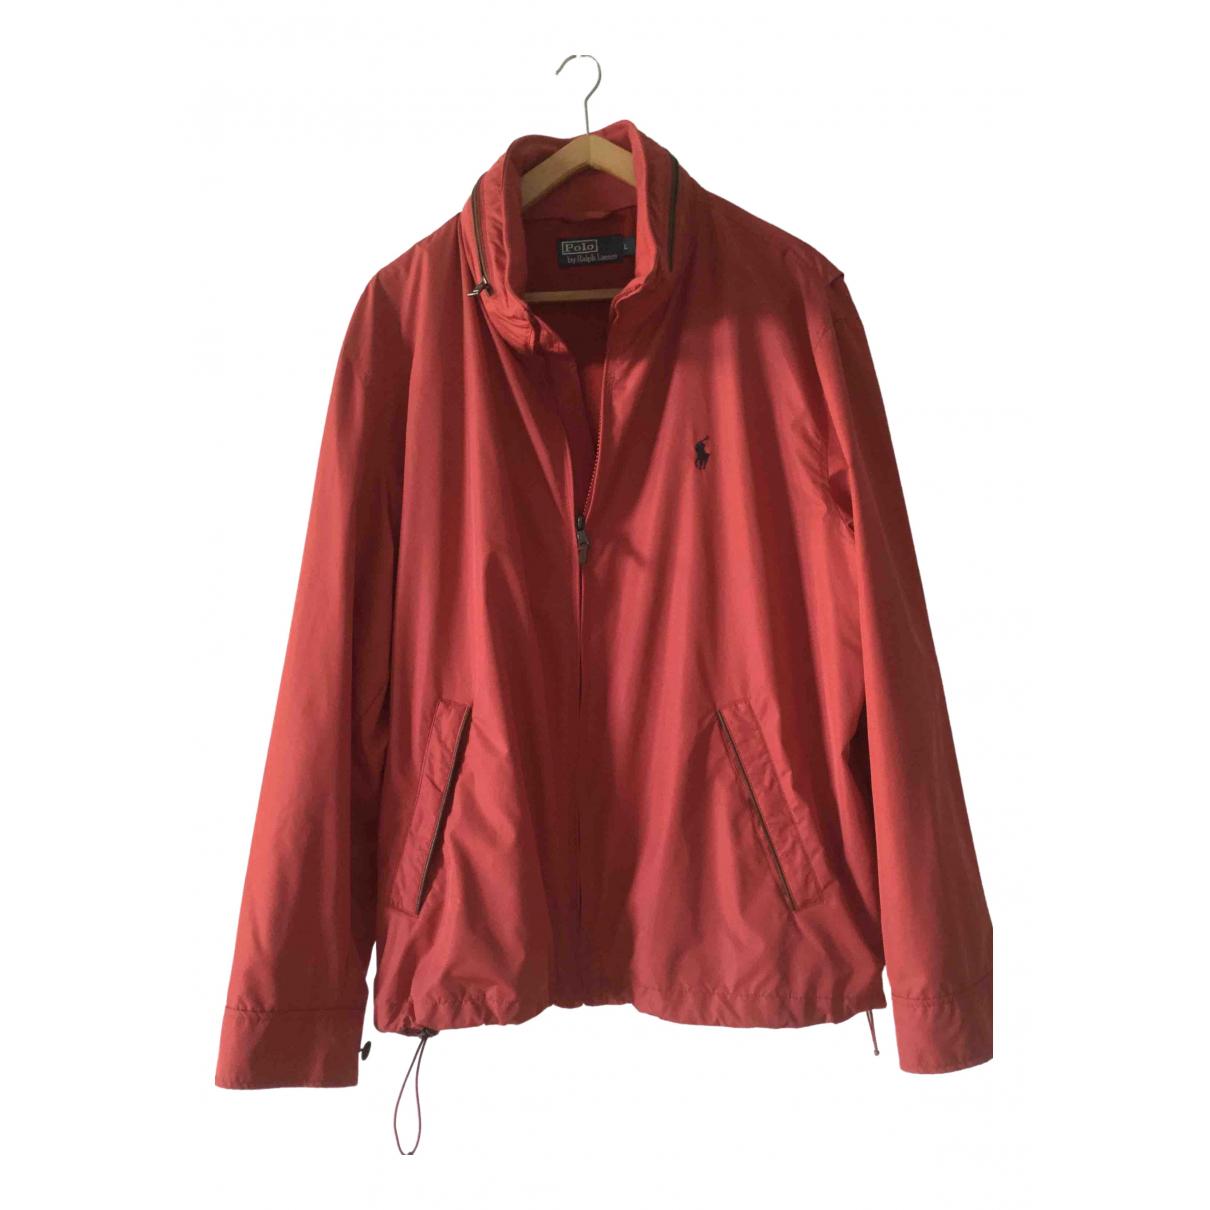 Polo Ralph Lauren \N Red jacket  for Men L International